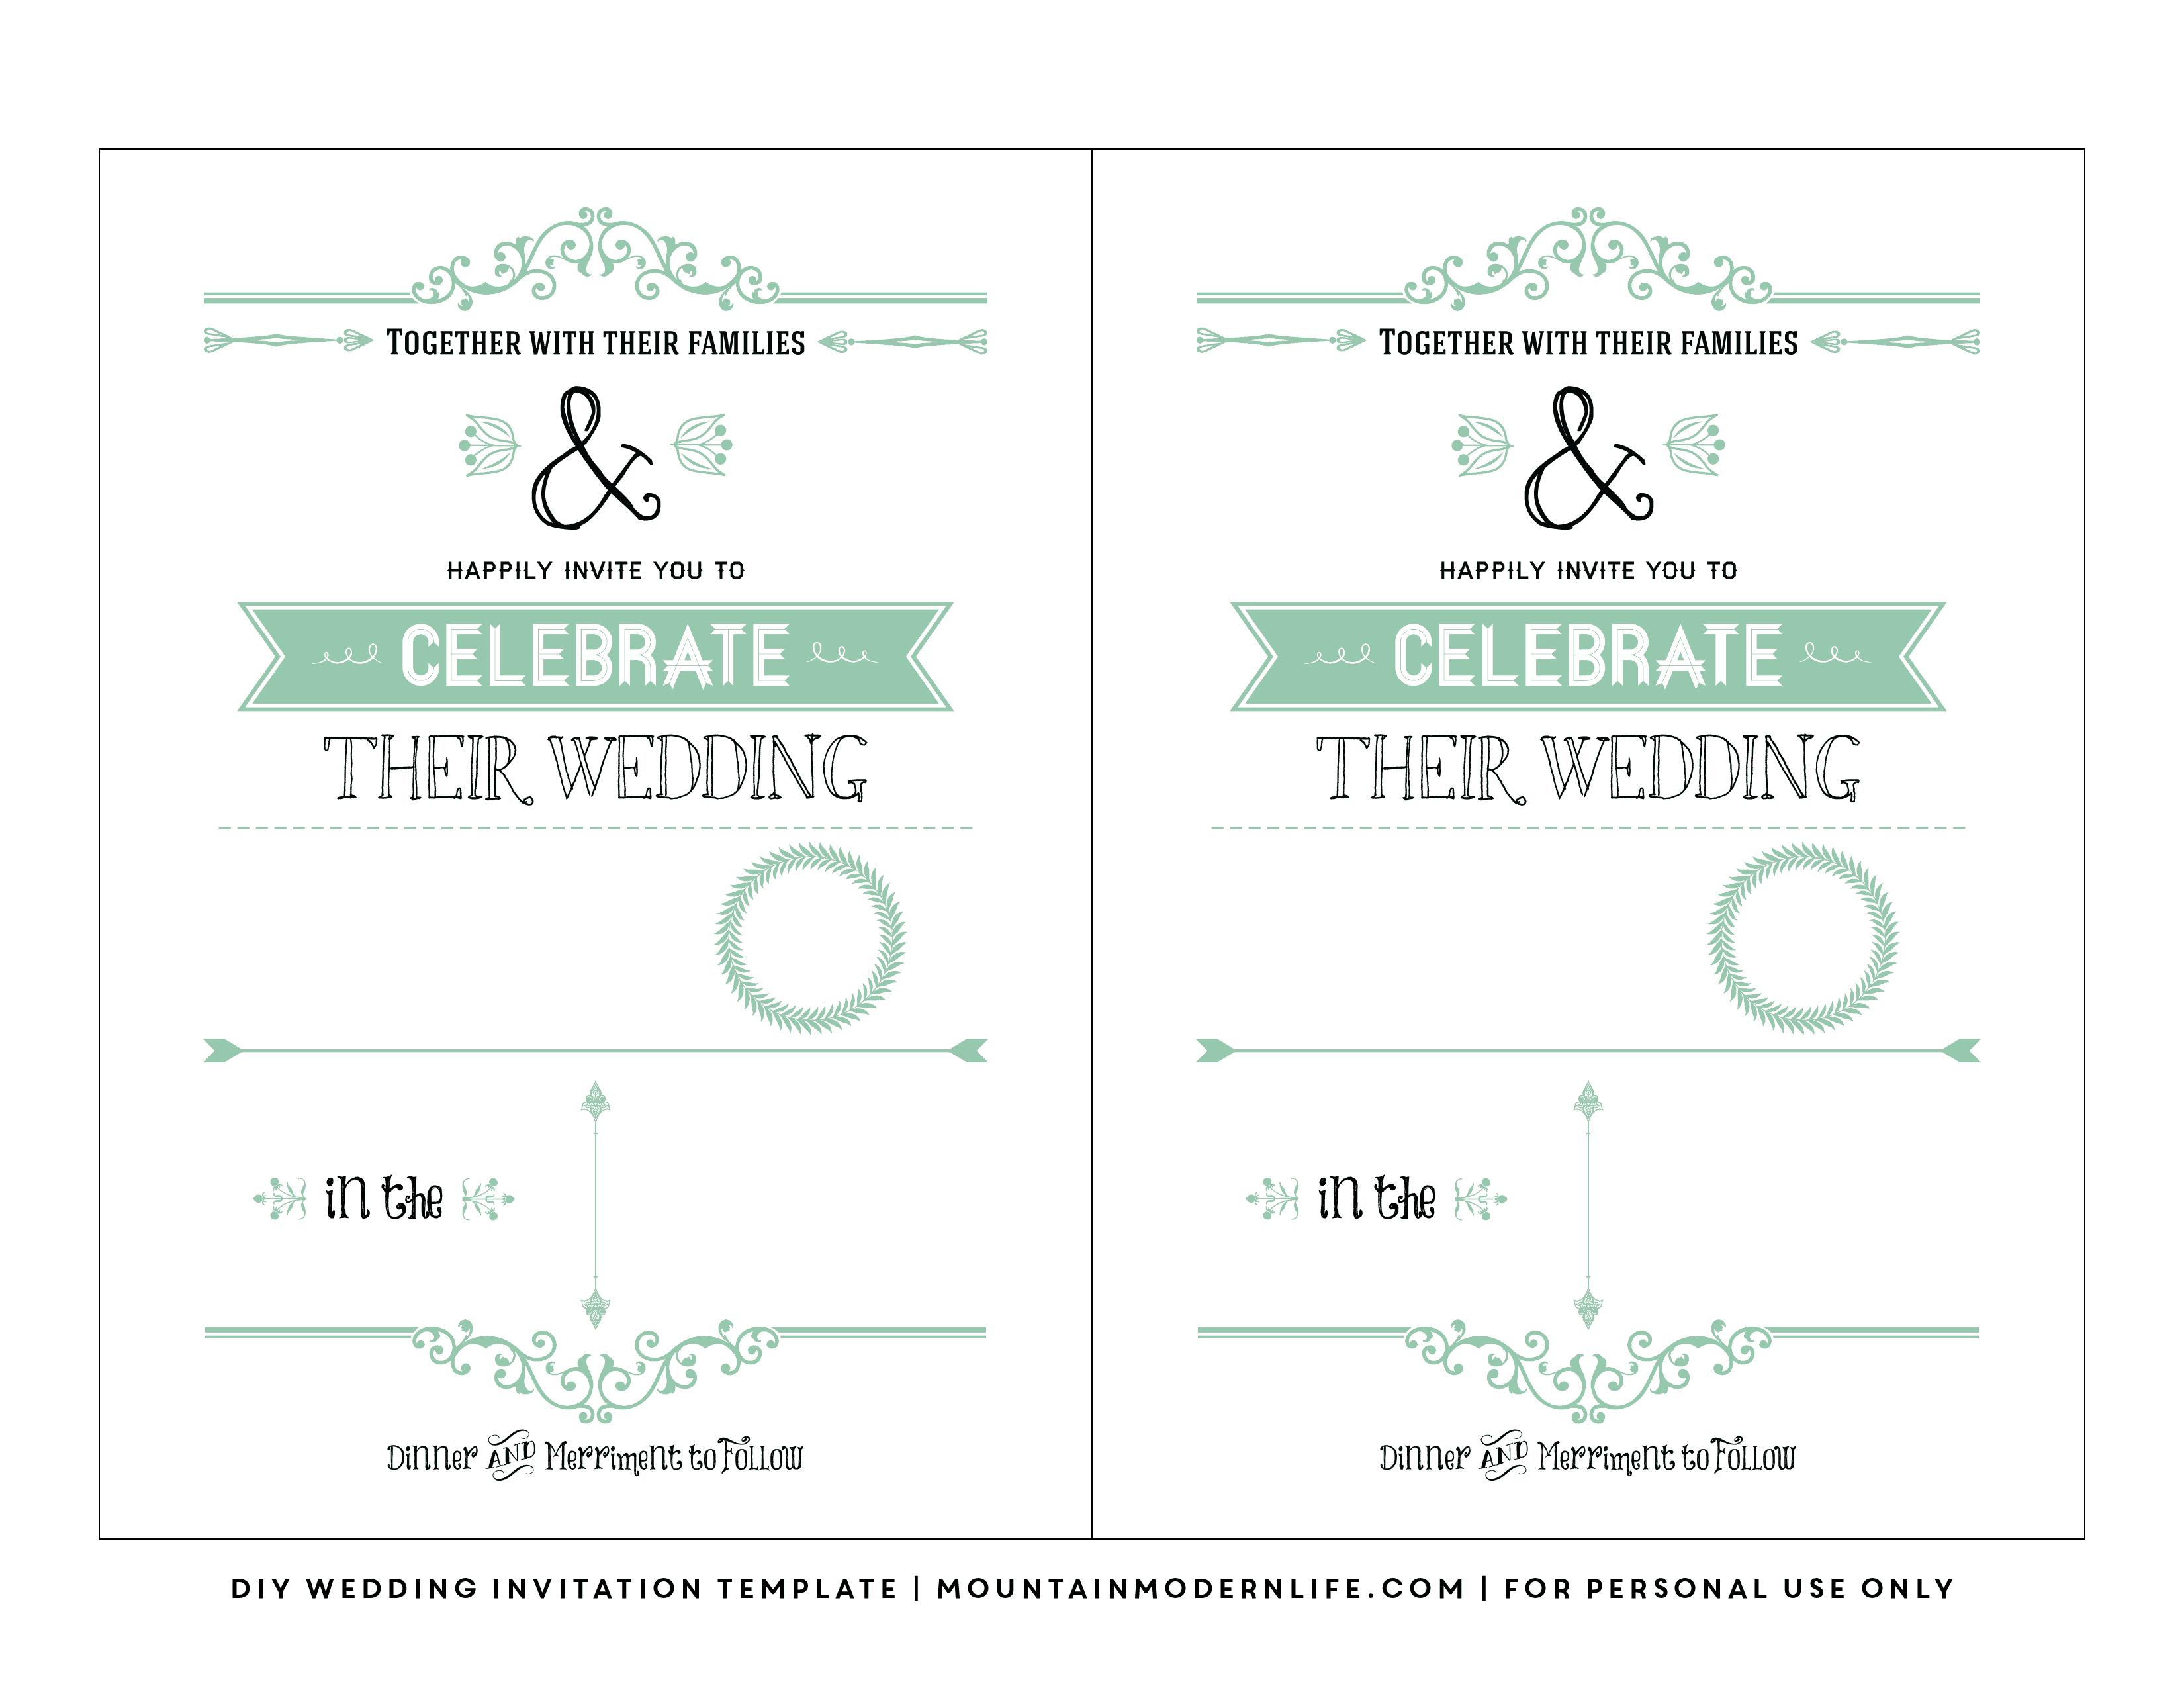 Free Wedding Invitation Template | Mountainmodernlife - Free Printable Wedding Invitations With Photo